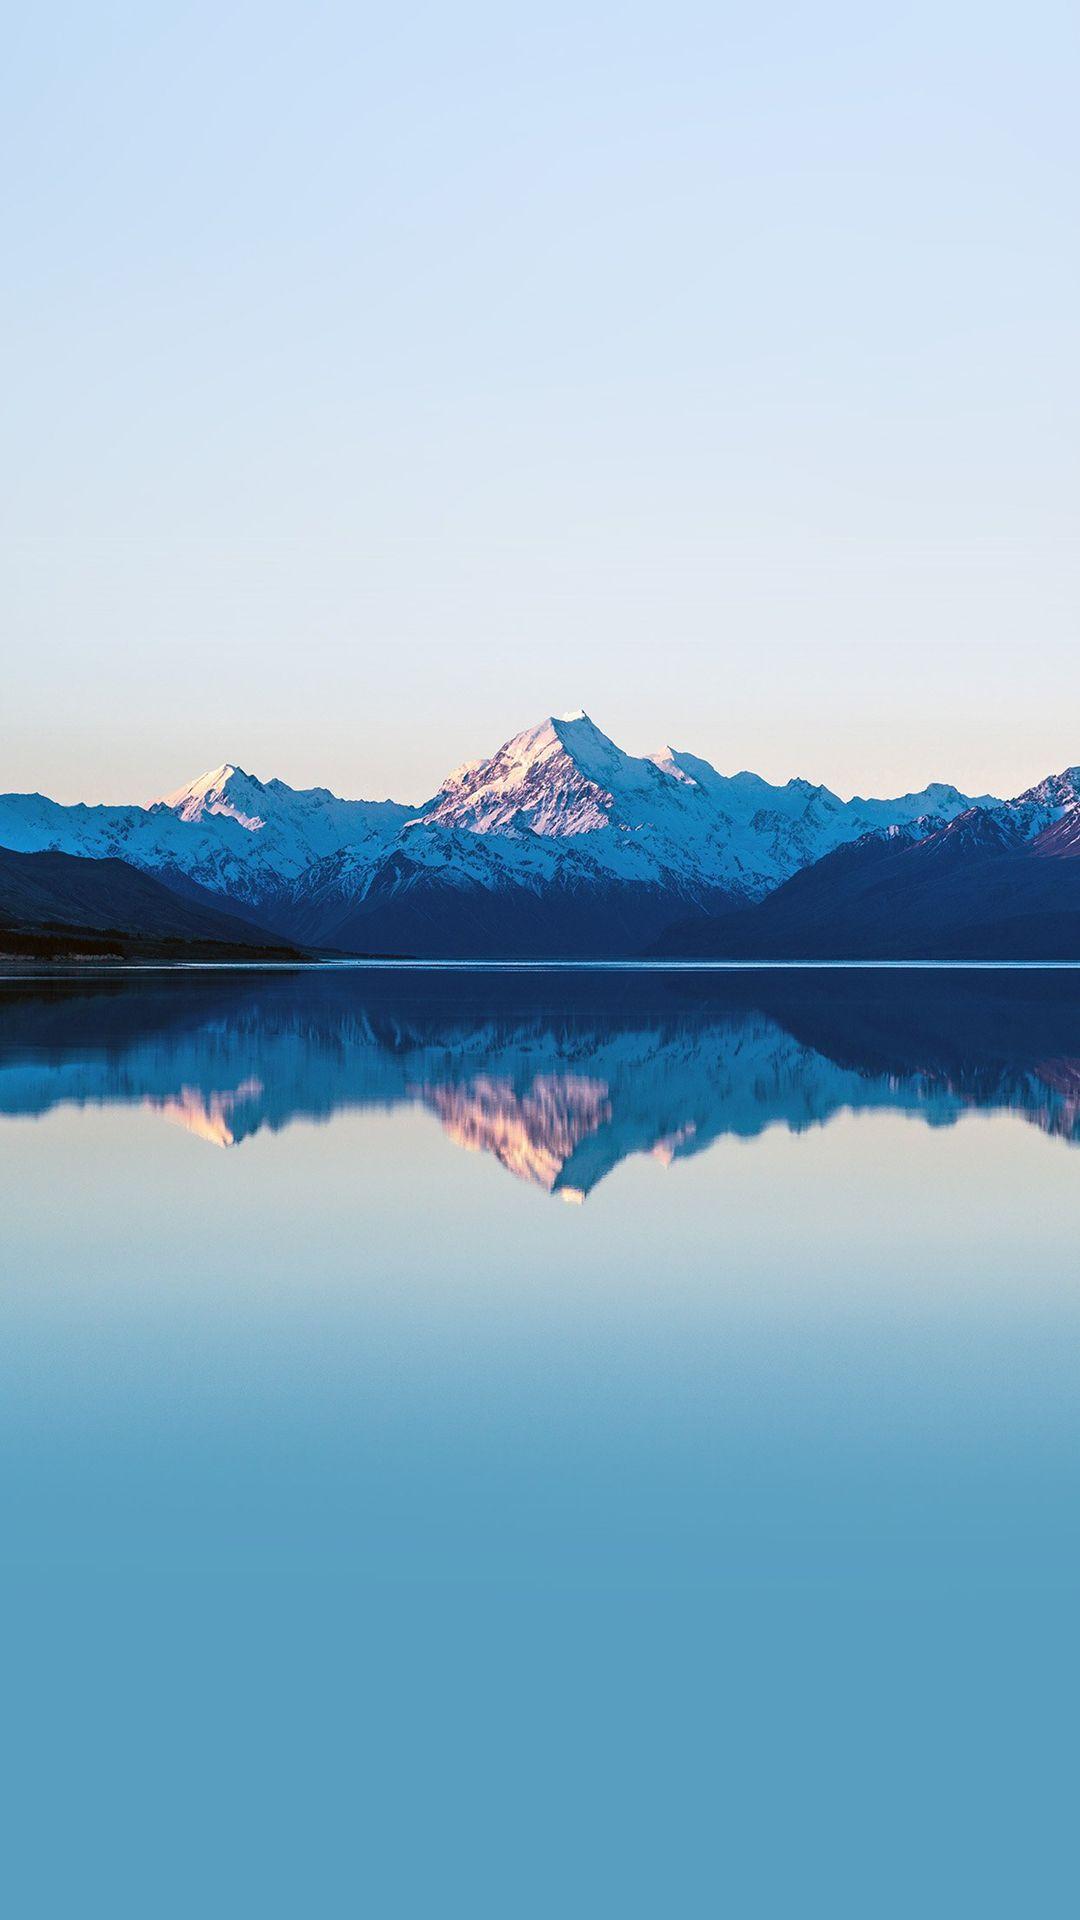 Mountain lake beautiful nature blue sky iphone 6 plus - Beautiful nature wallpapers for iphone ...